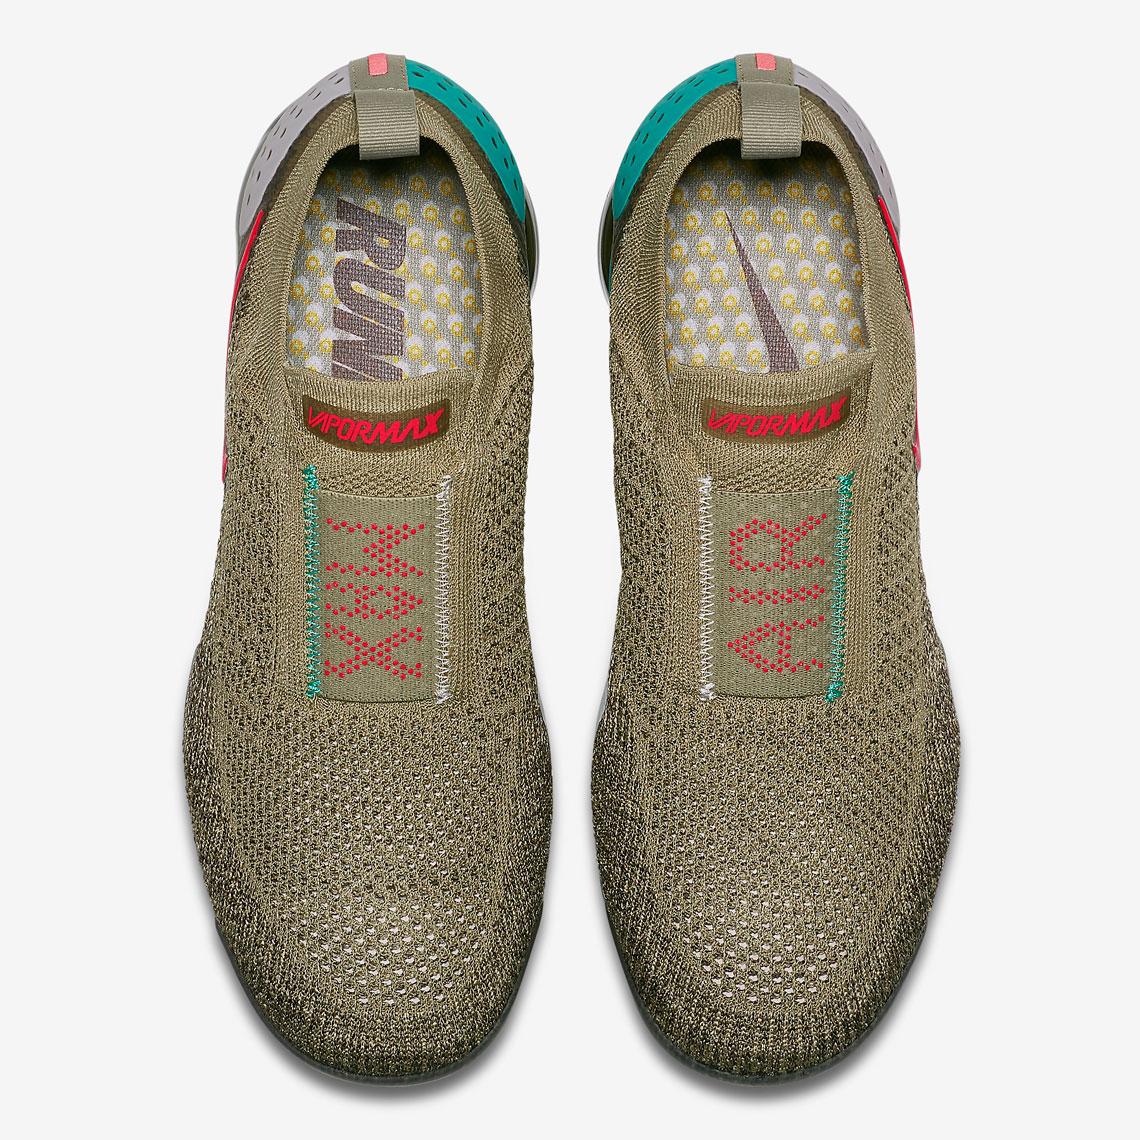 Nike Vapormax Moc 2 Release Info AH7006 200 AH7006 100